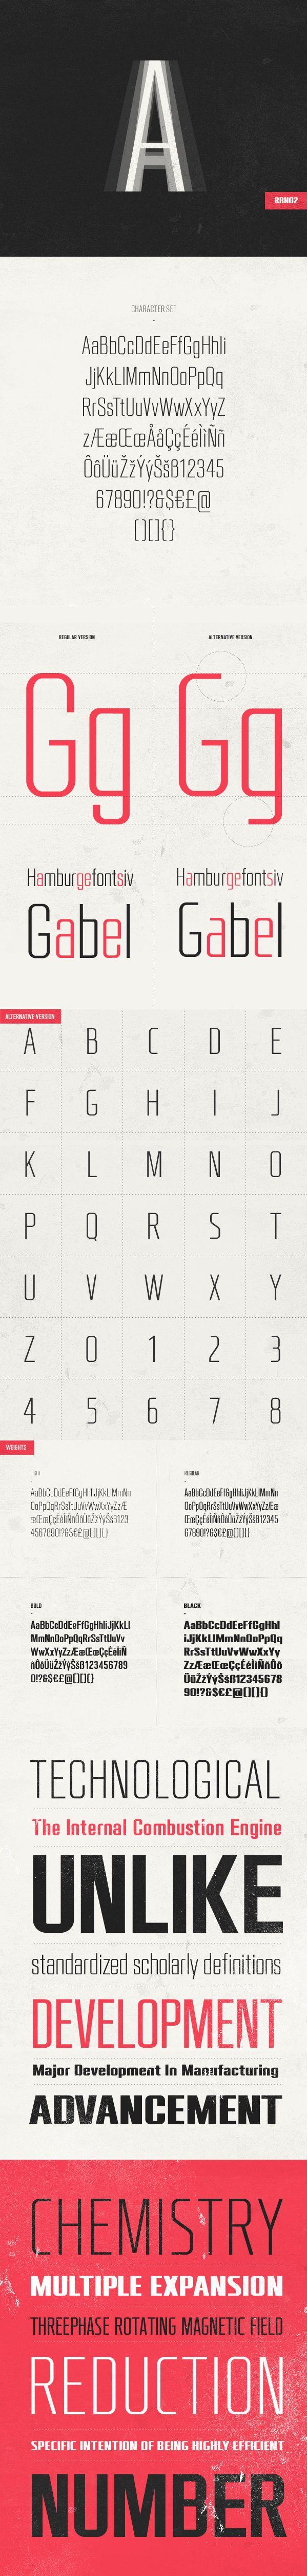 RBNo2 free font - Fontfabric